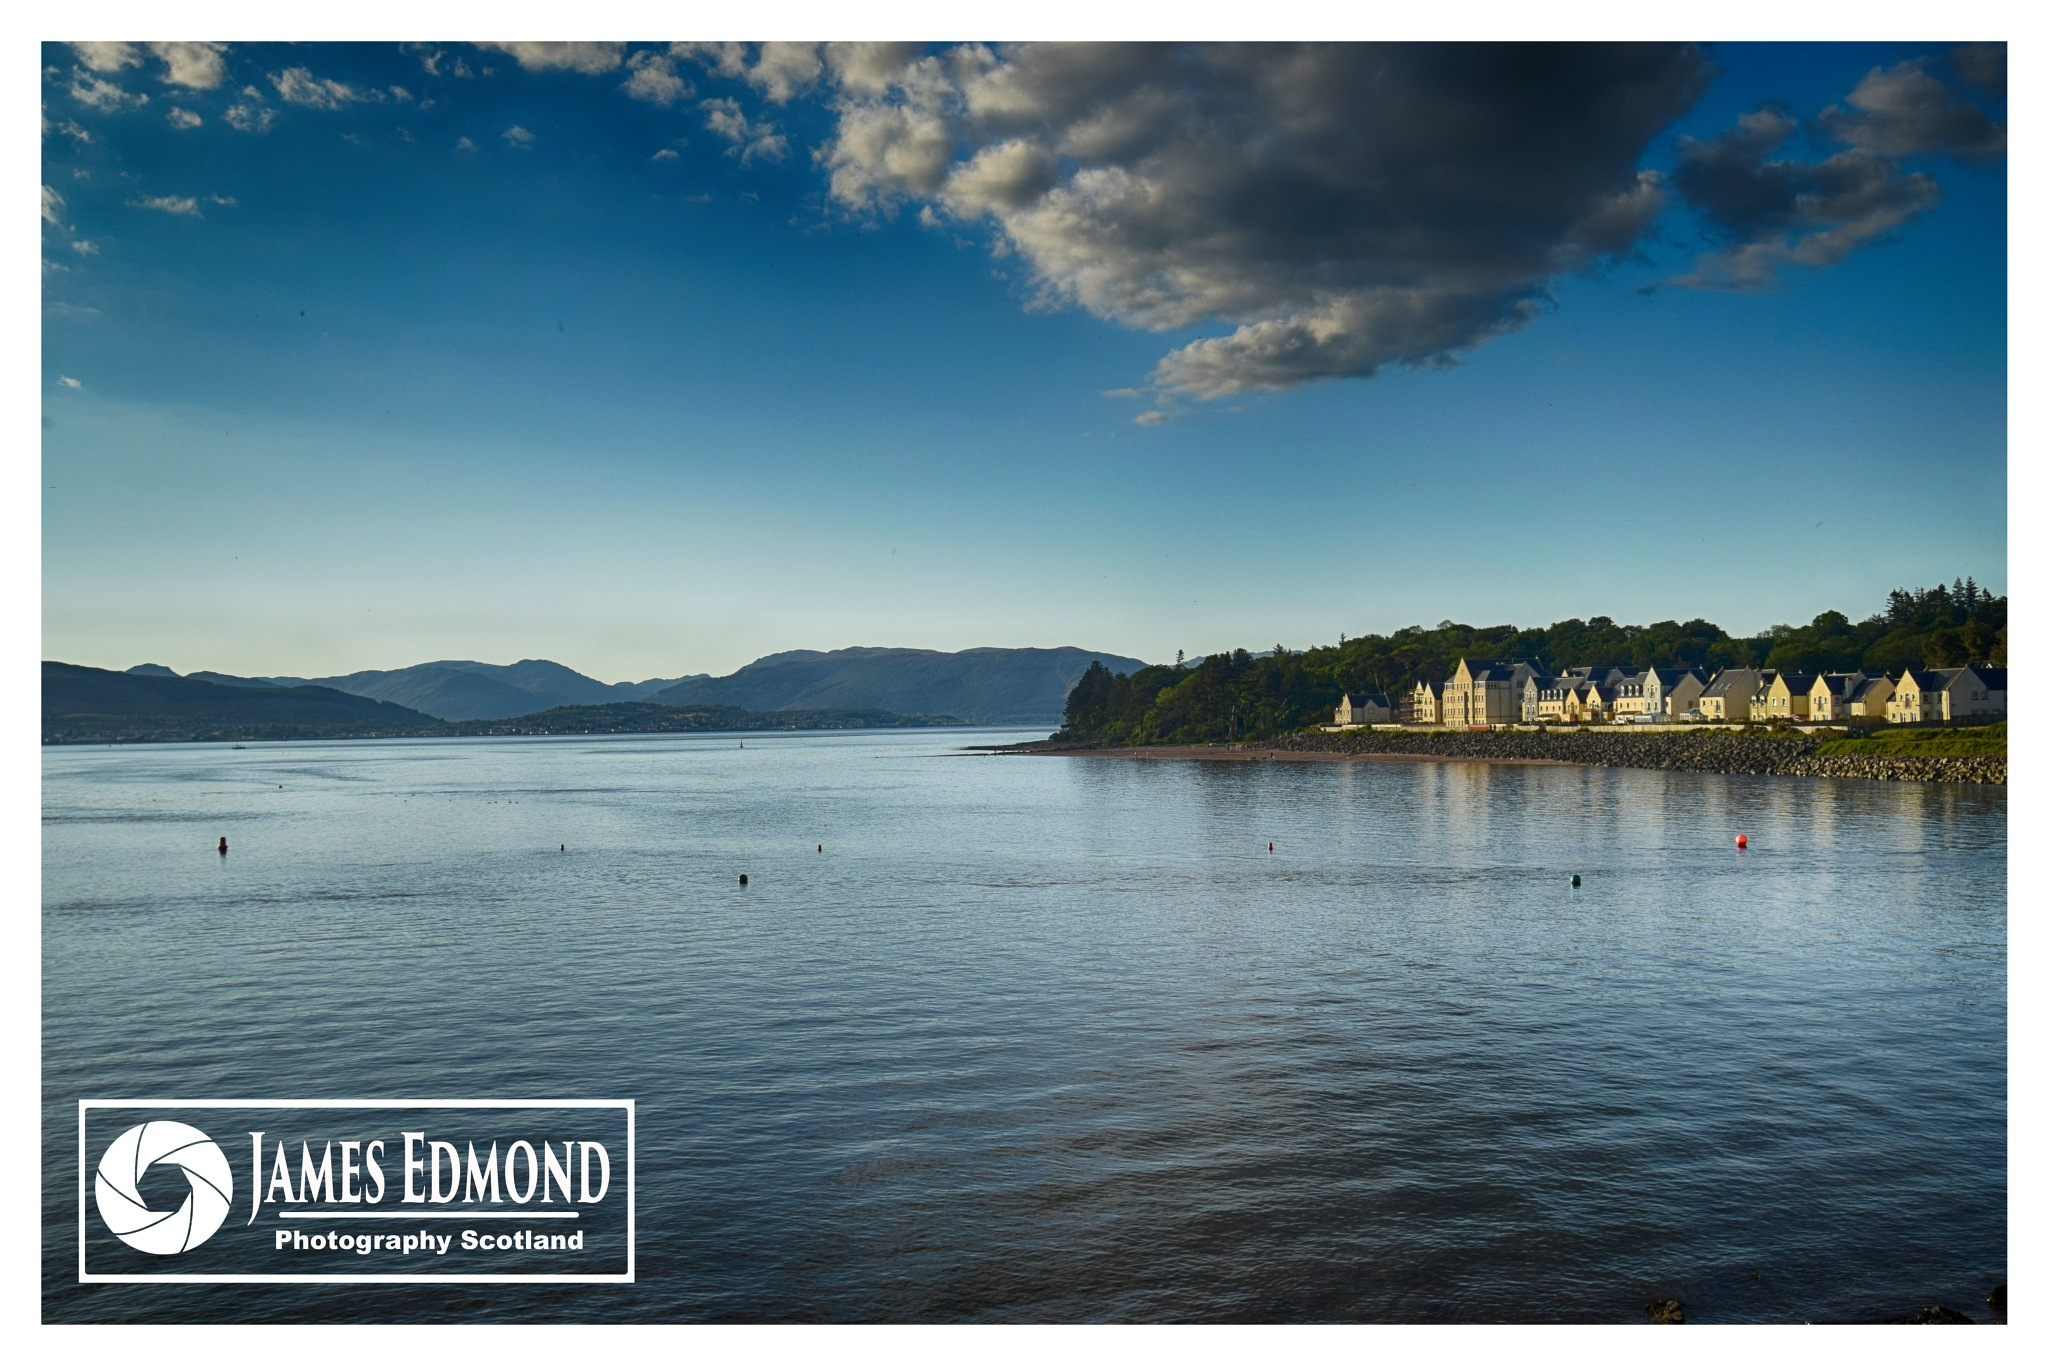 Stunning Scotland by James Edmond Photography